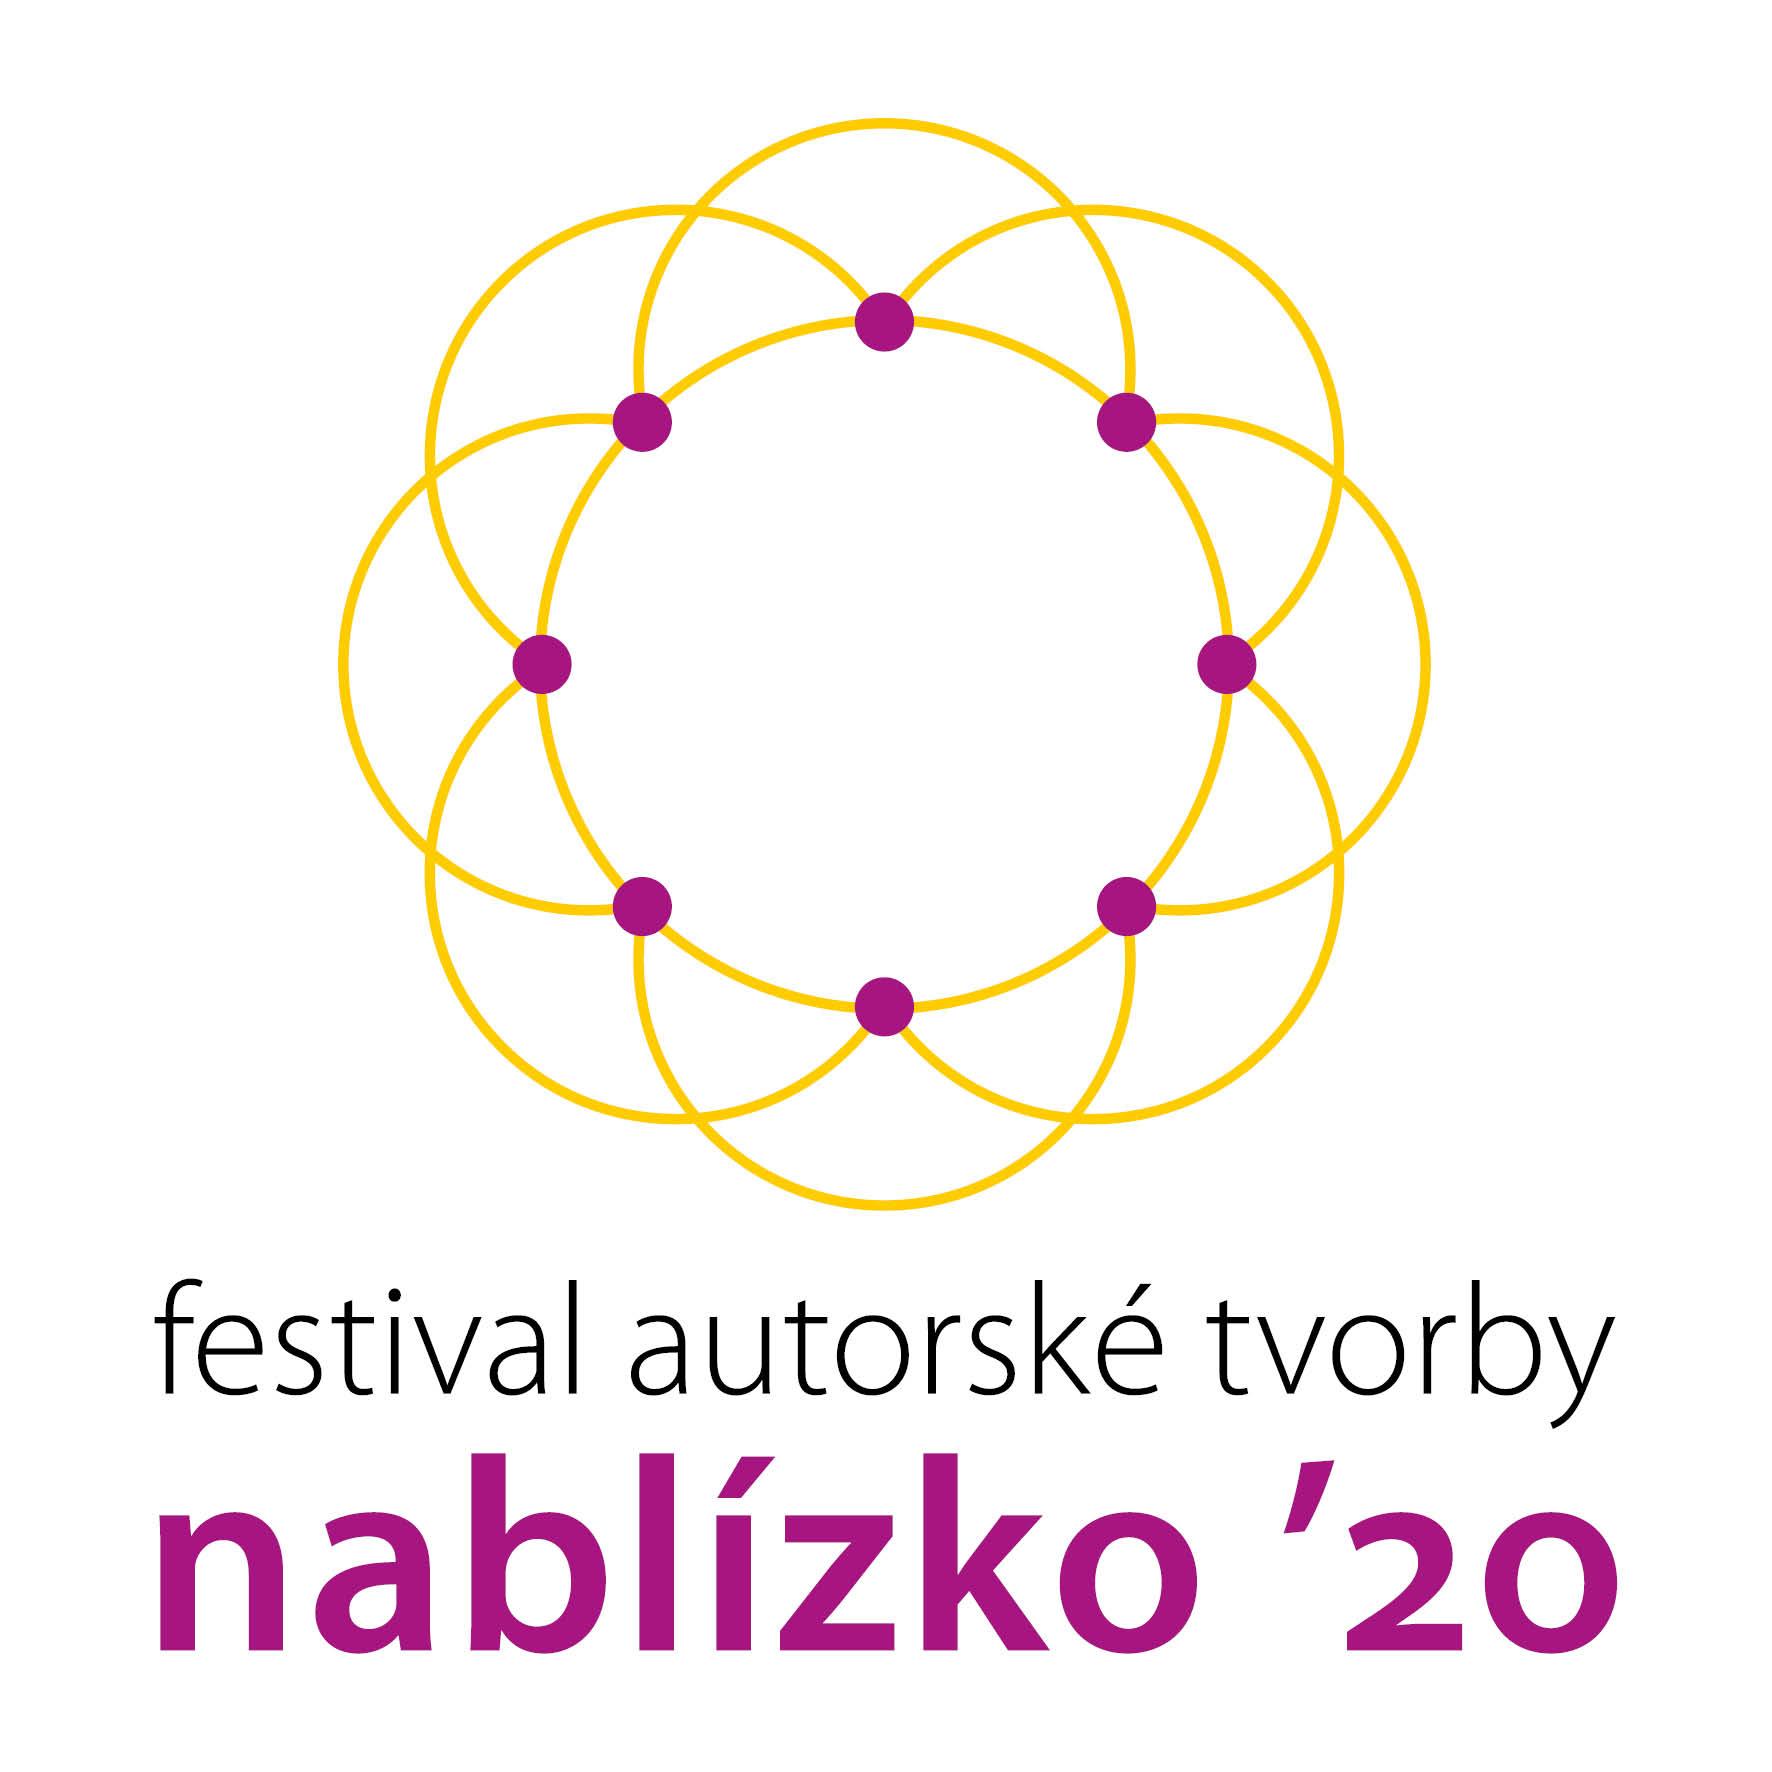 Festival Nablízko 2020